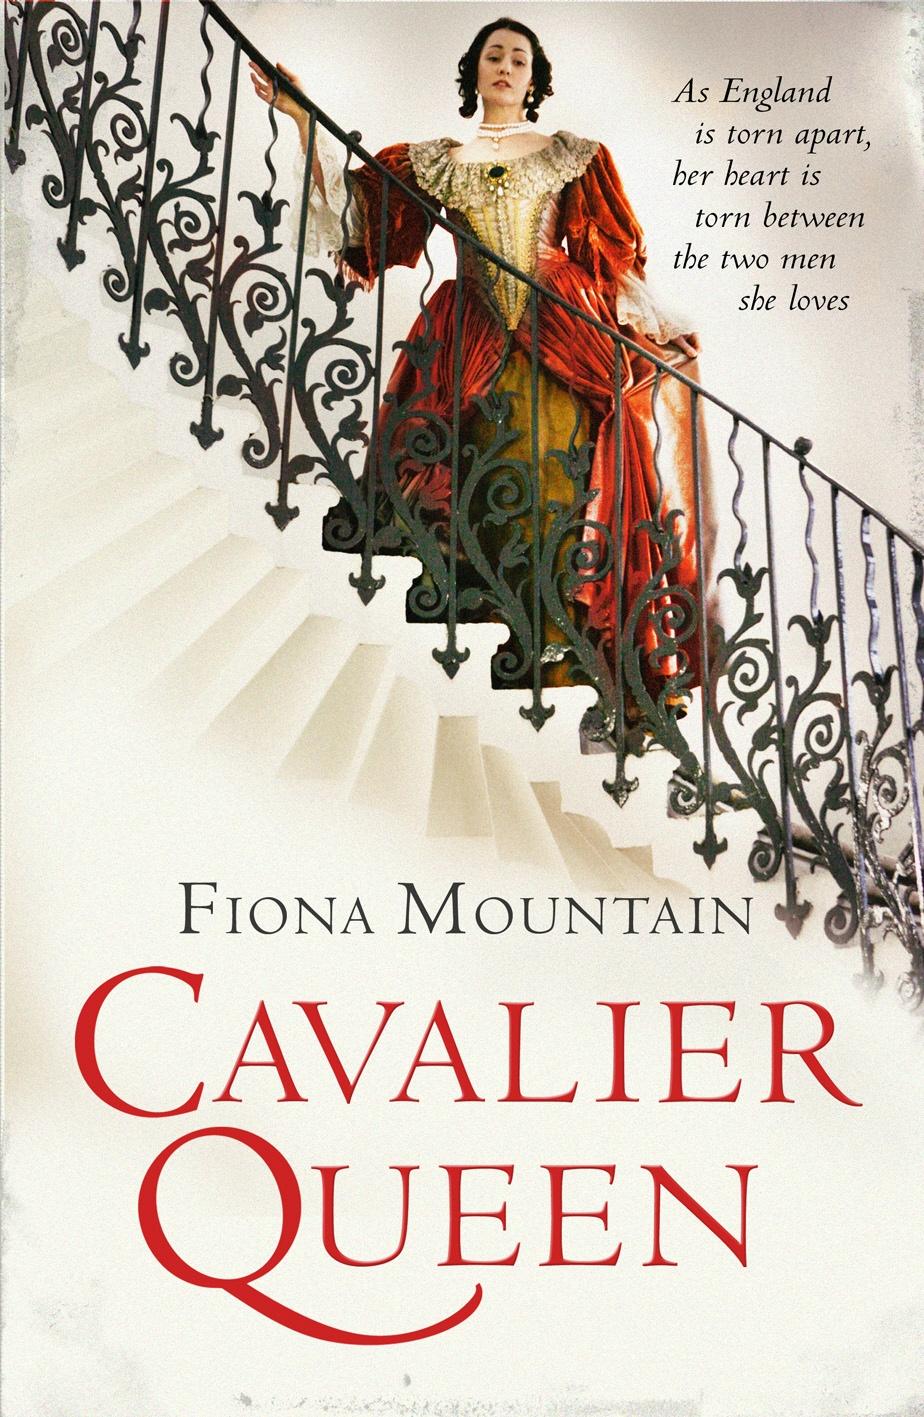 Cavalier Queen by Fiona Mountain - Penguin Books Australia